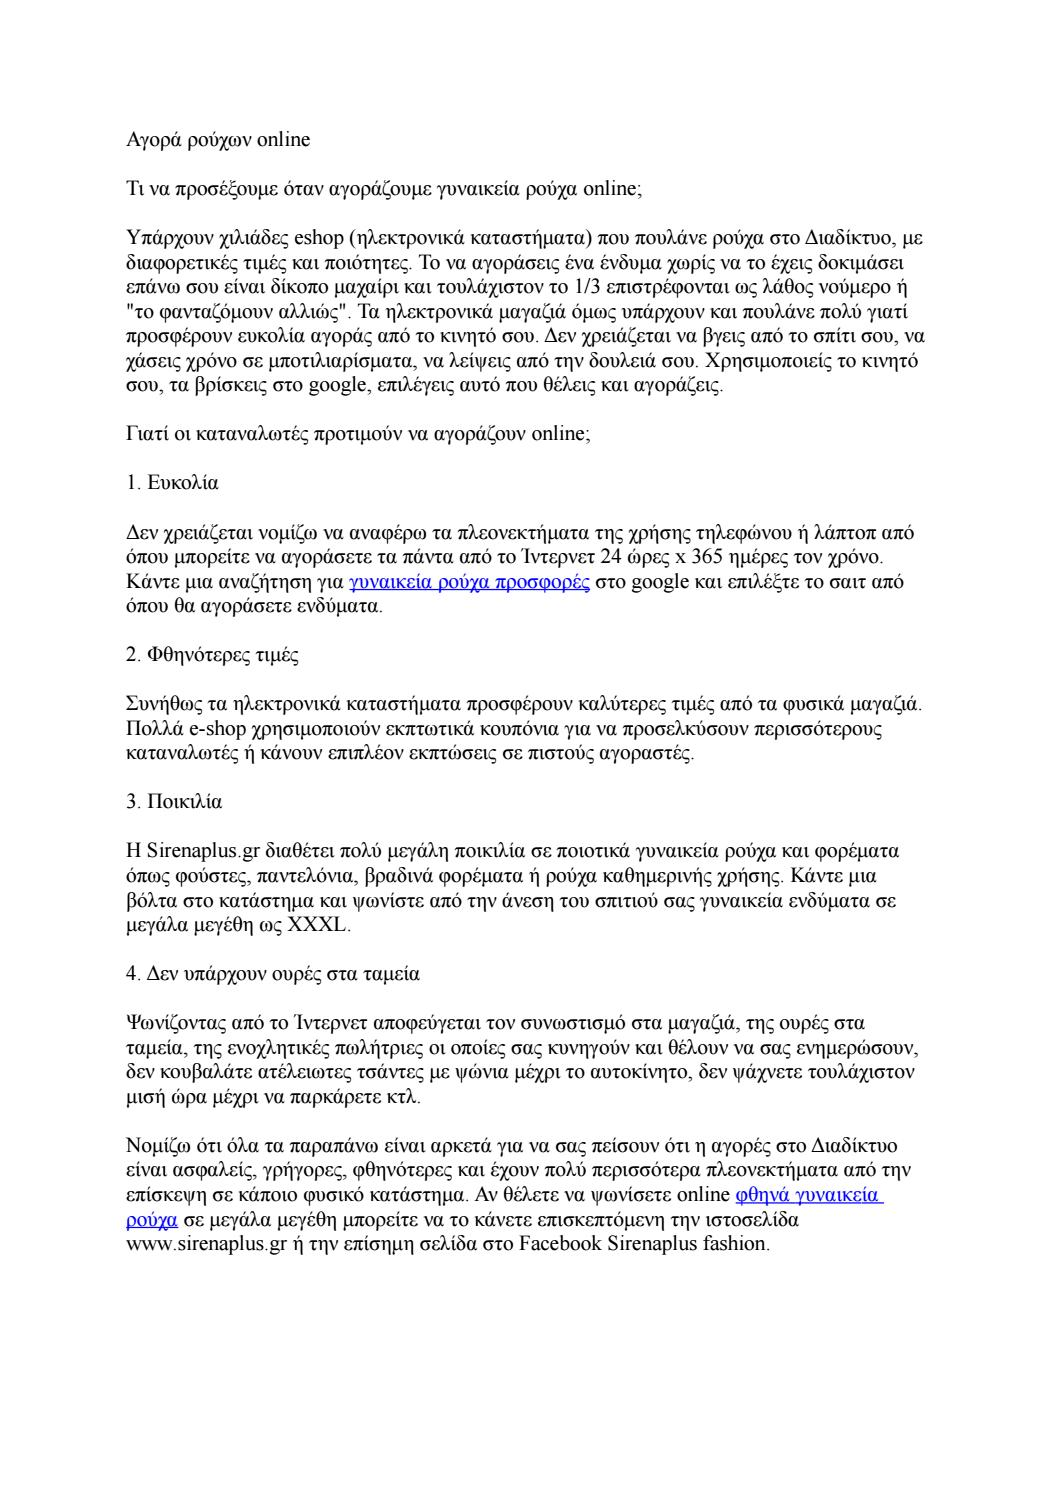 41ad840a4b7 Agora rouxon online by Pano Kontogiannis (Пано Кондоянис) - issuu